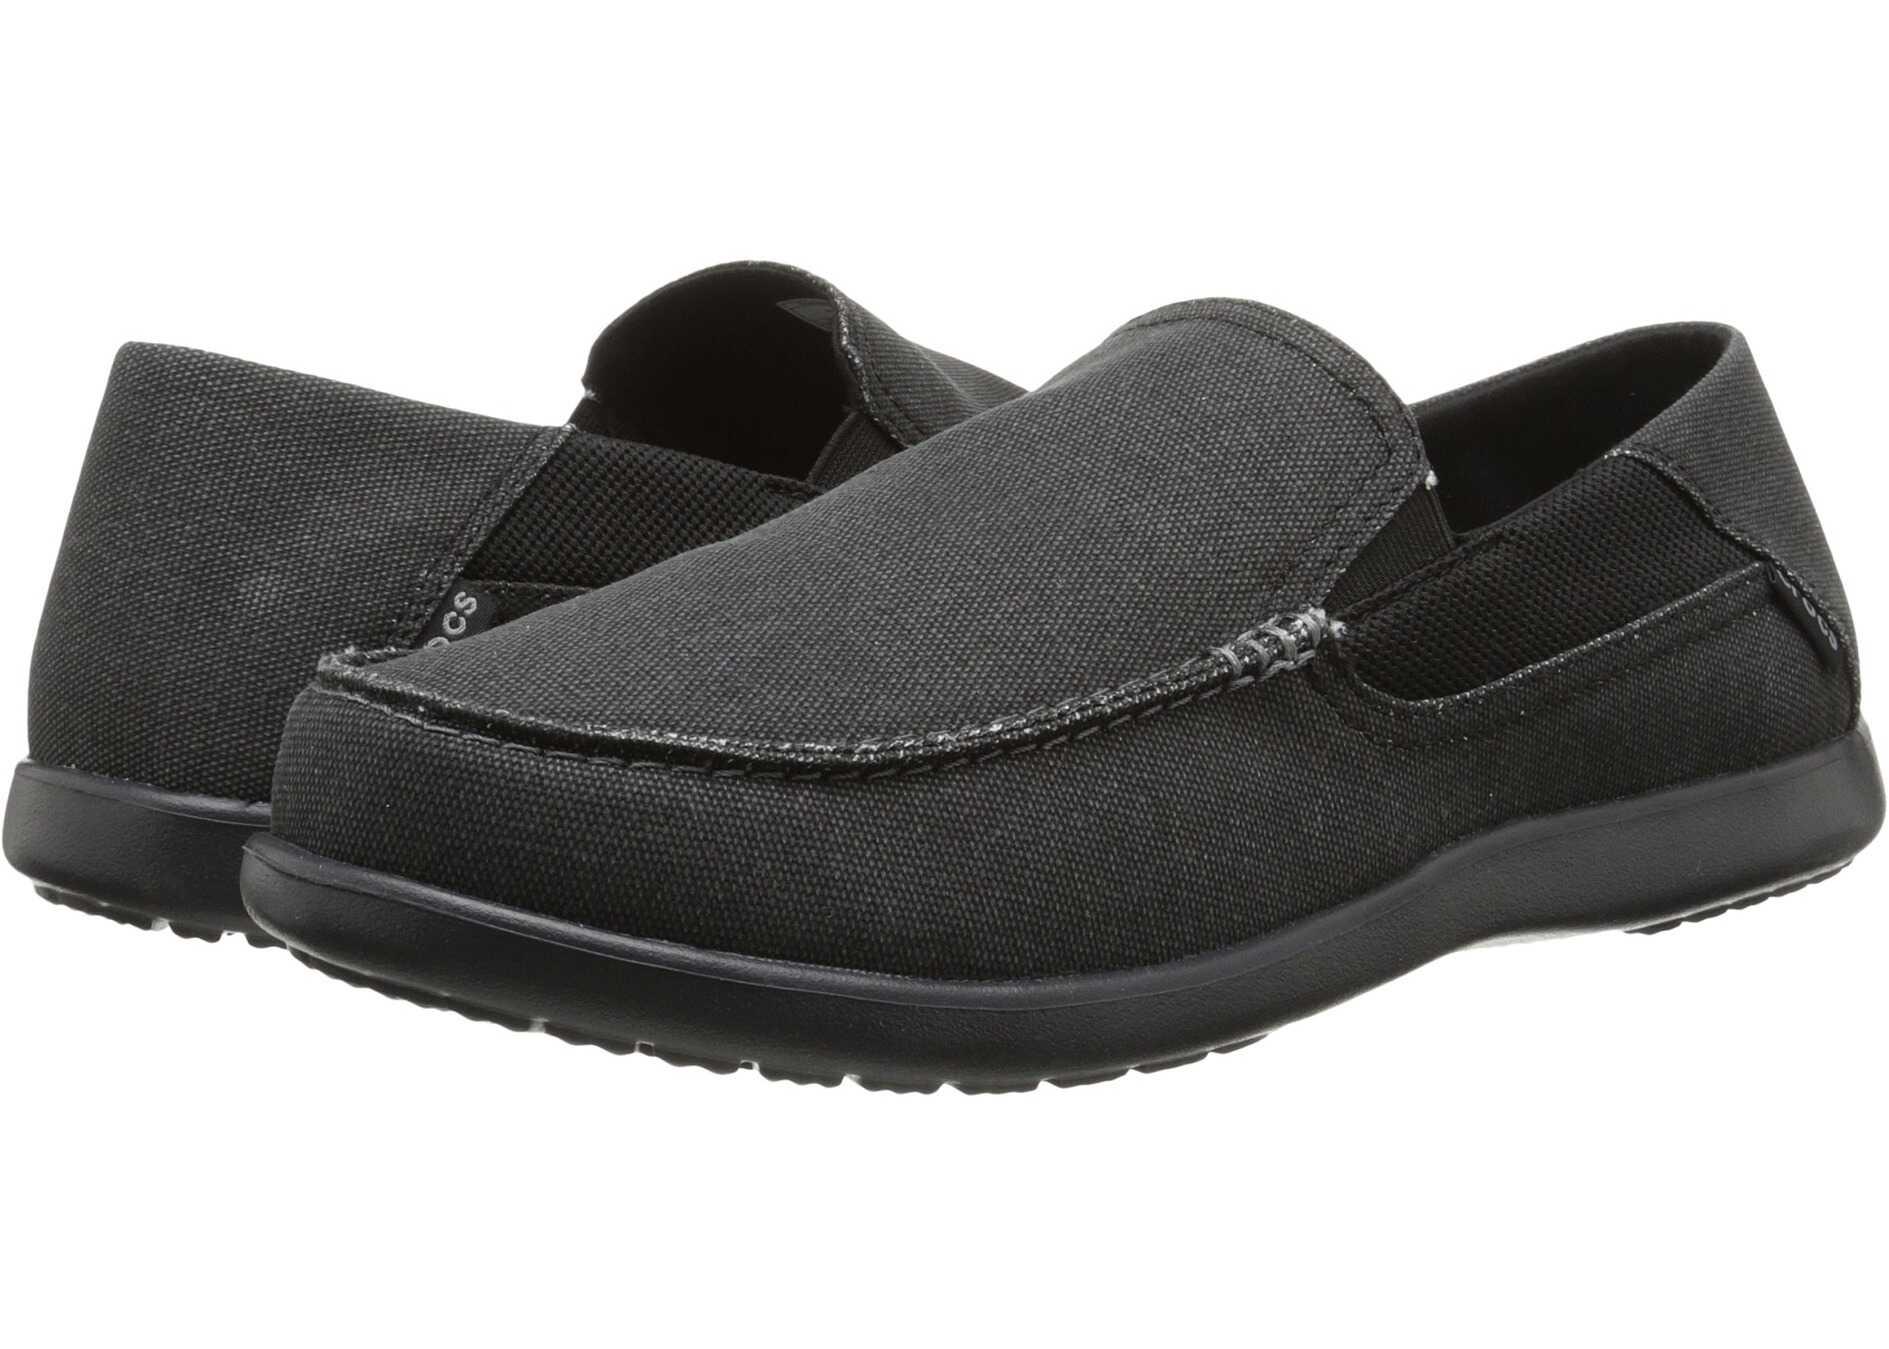 Crocs Santa Cruz 2 Luxe Black/Black